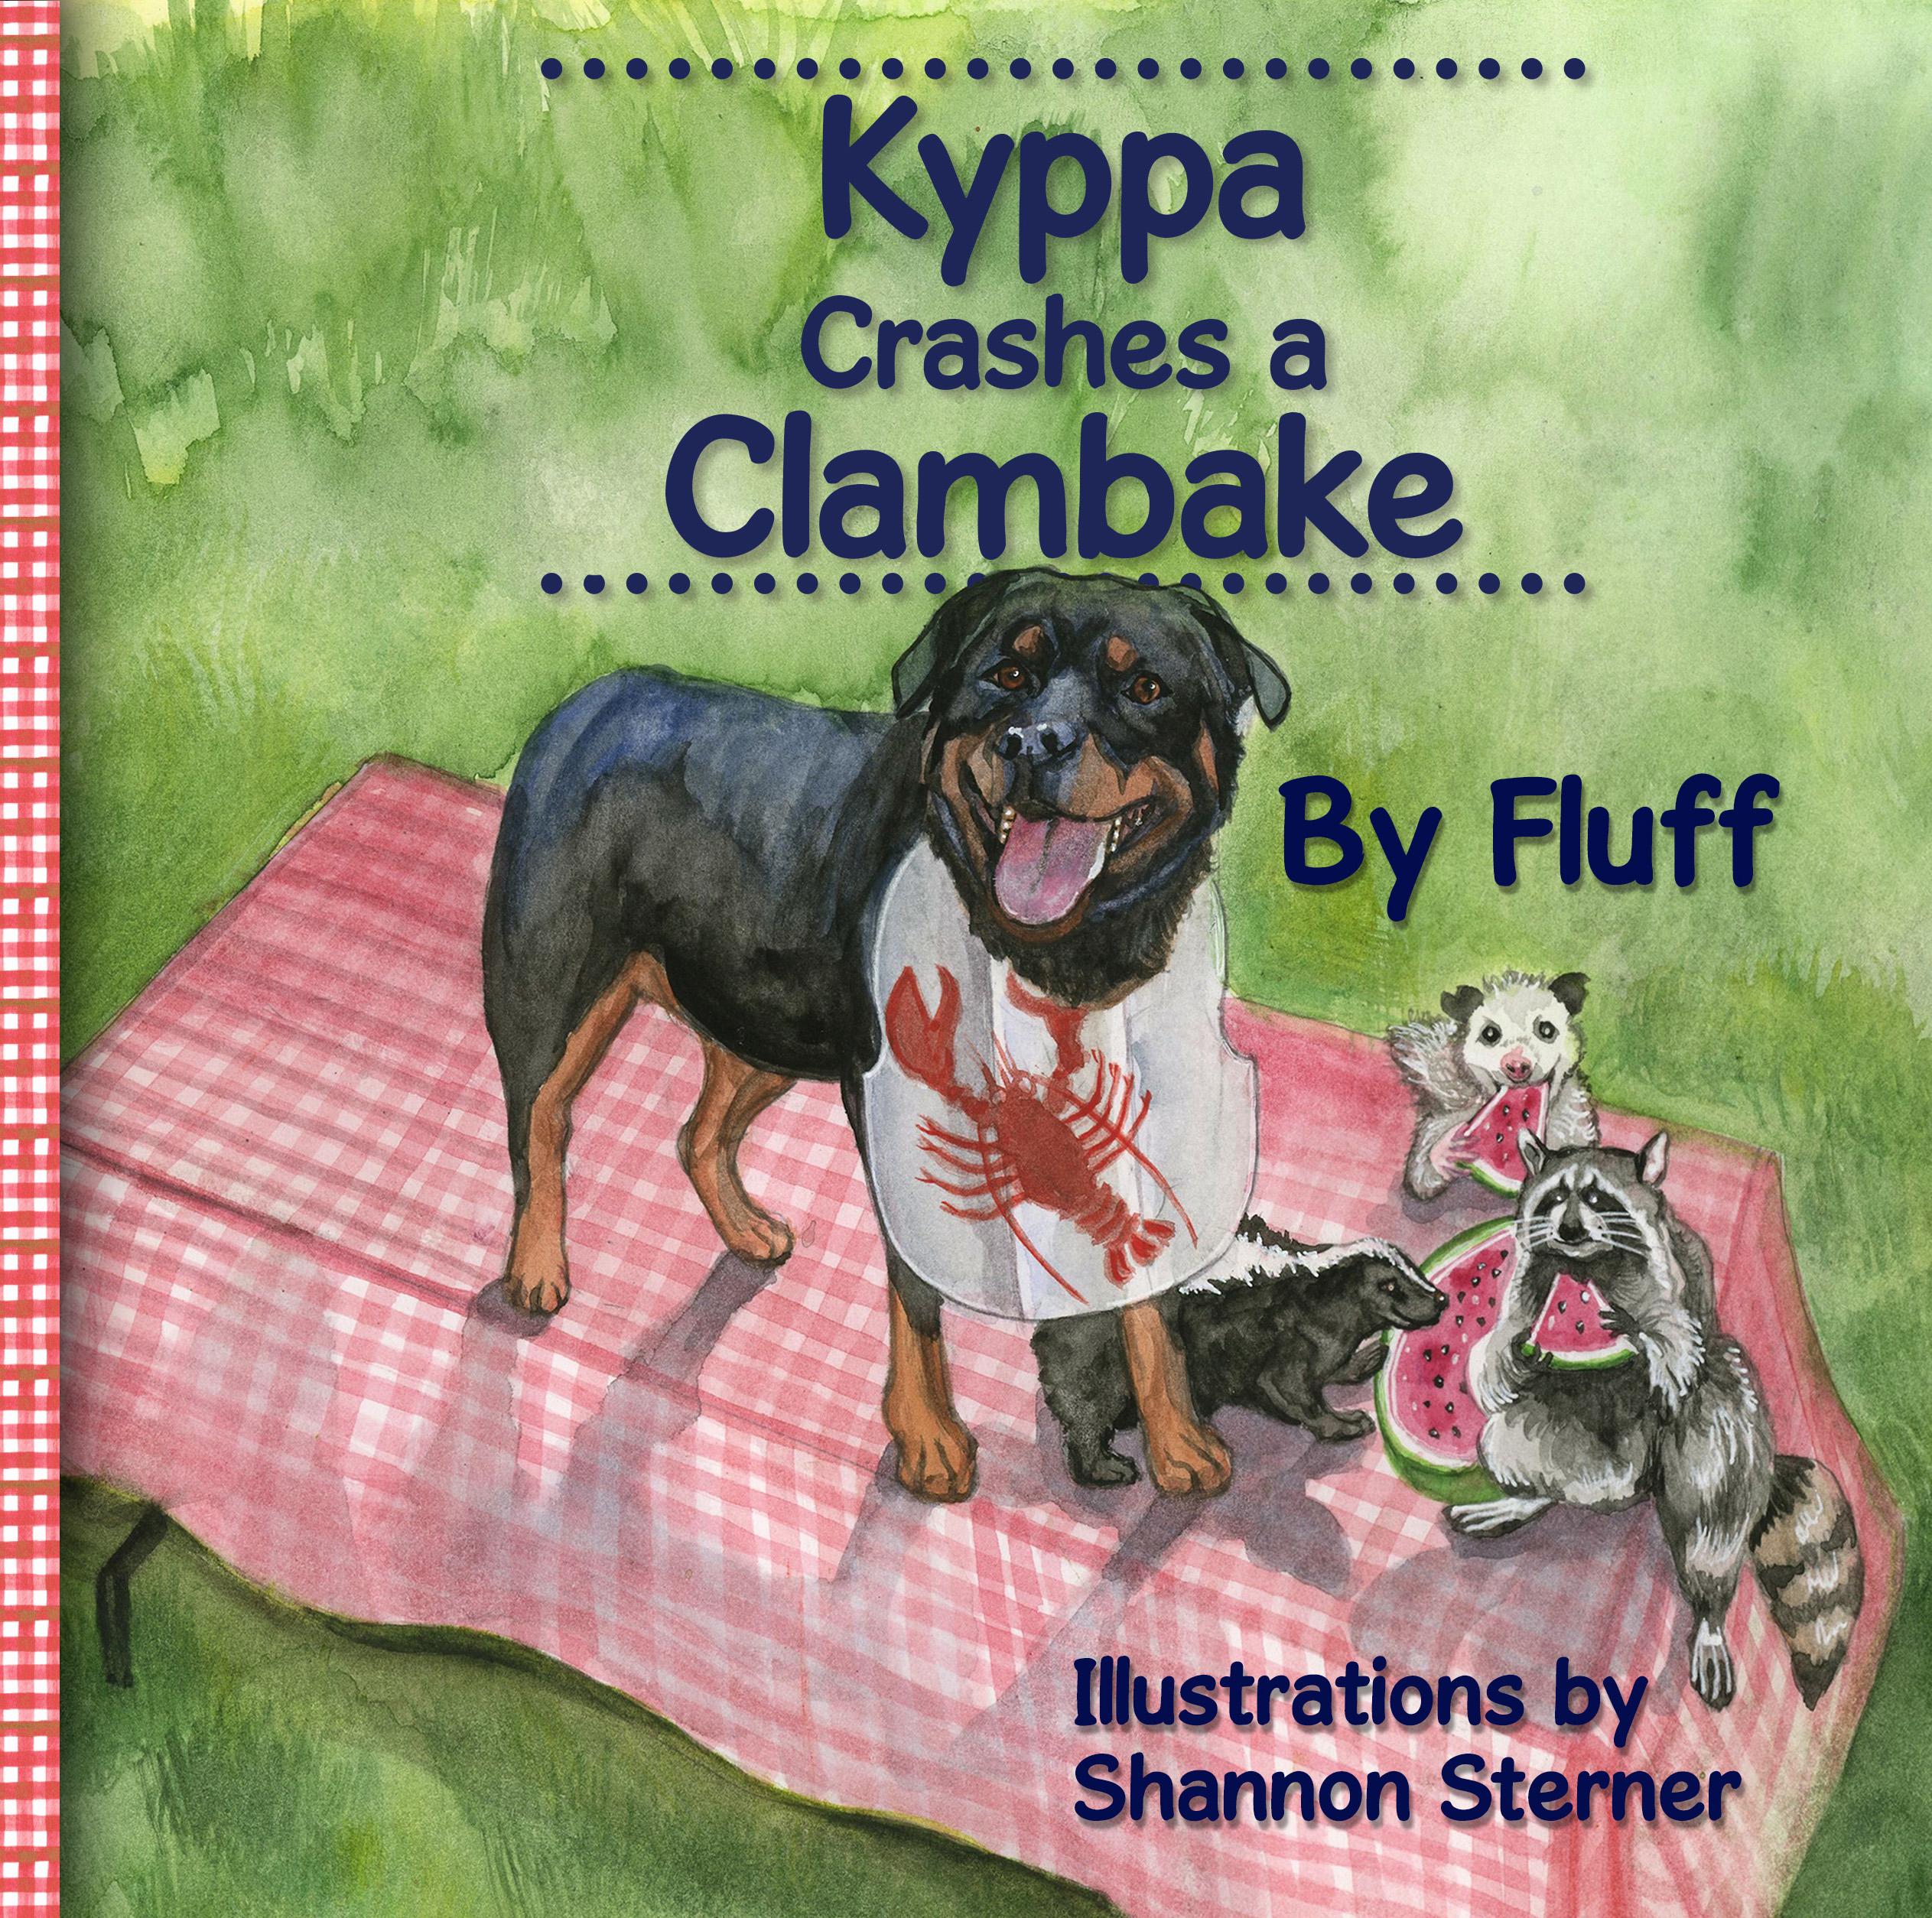 Kyppa Crashes a Clambake